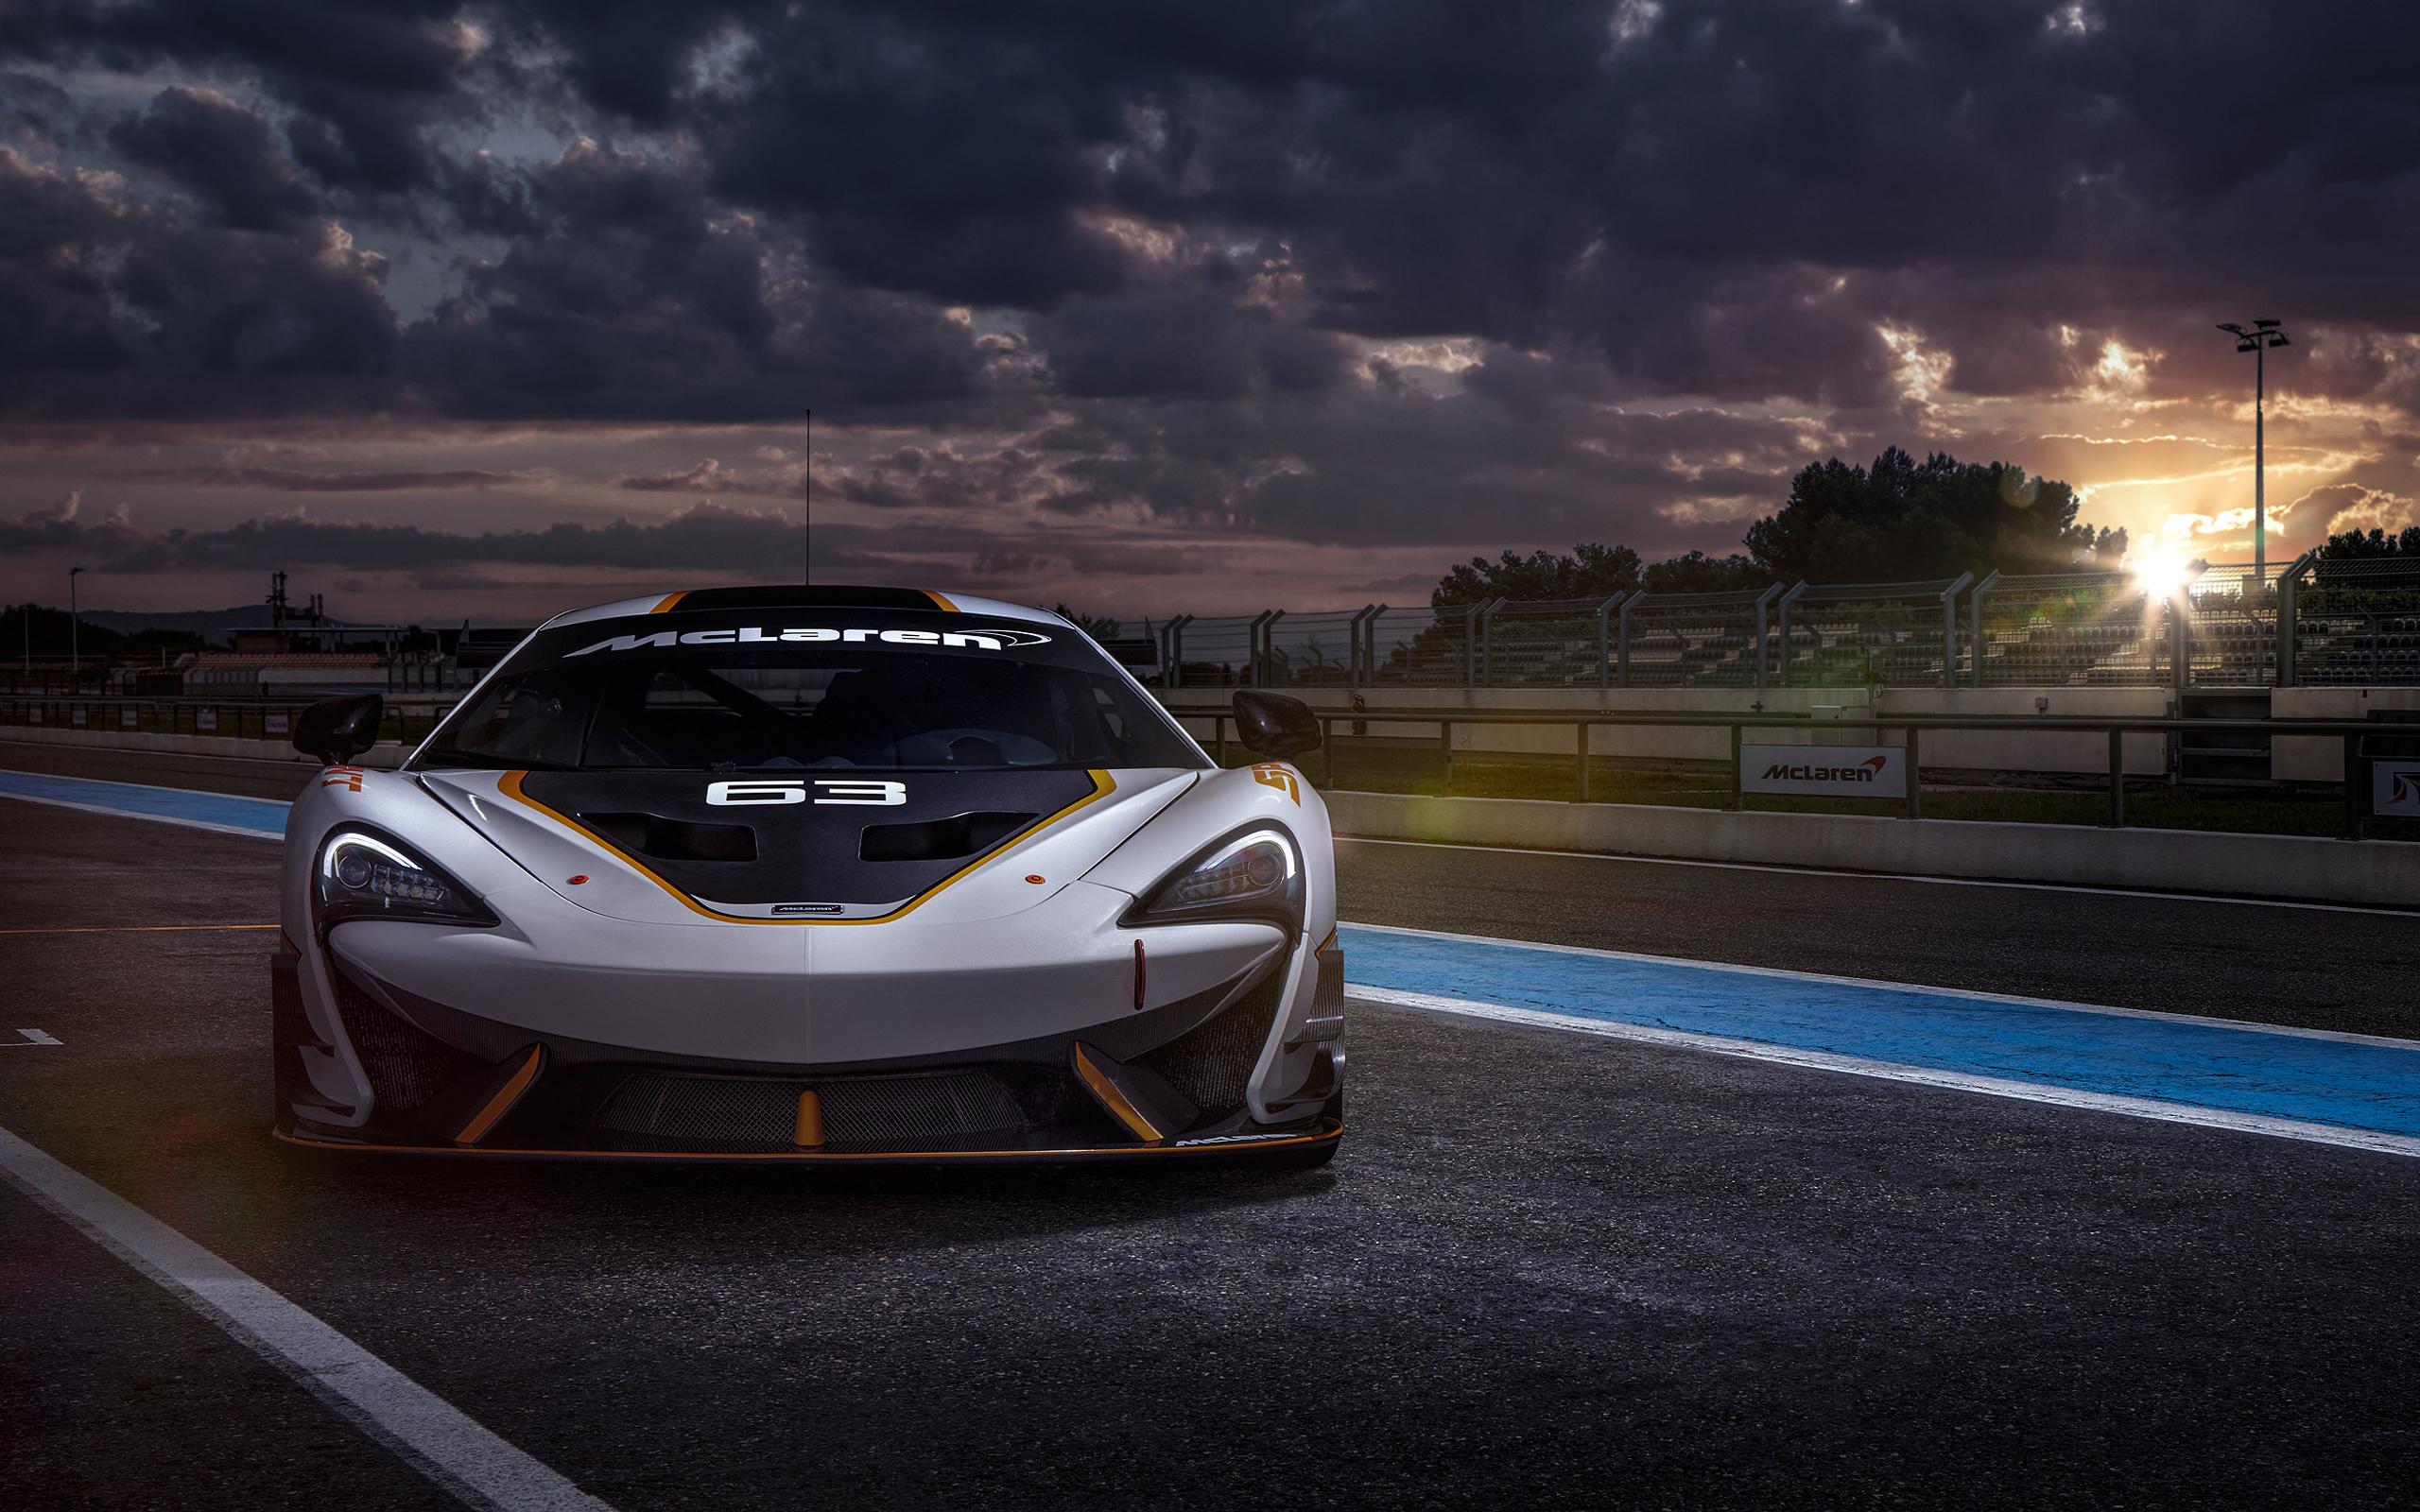 Wallpaper Full Hd Carros 11 1024 576: McLaren 650S GT Race Car HD Wallpaper